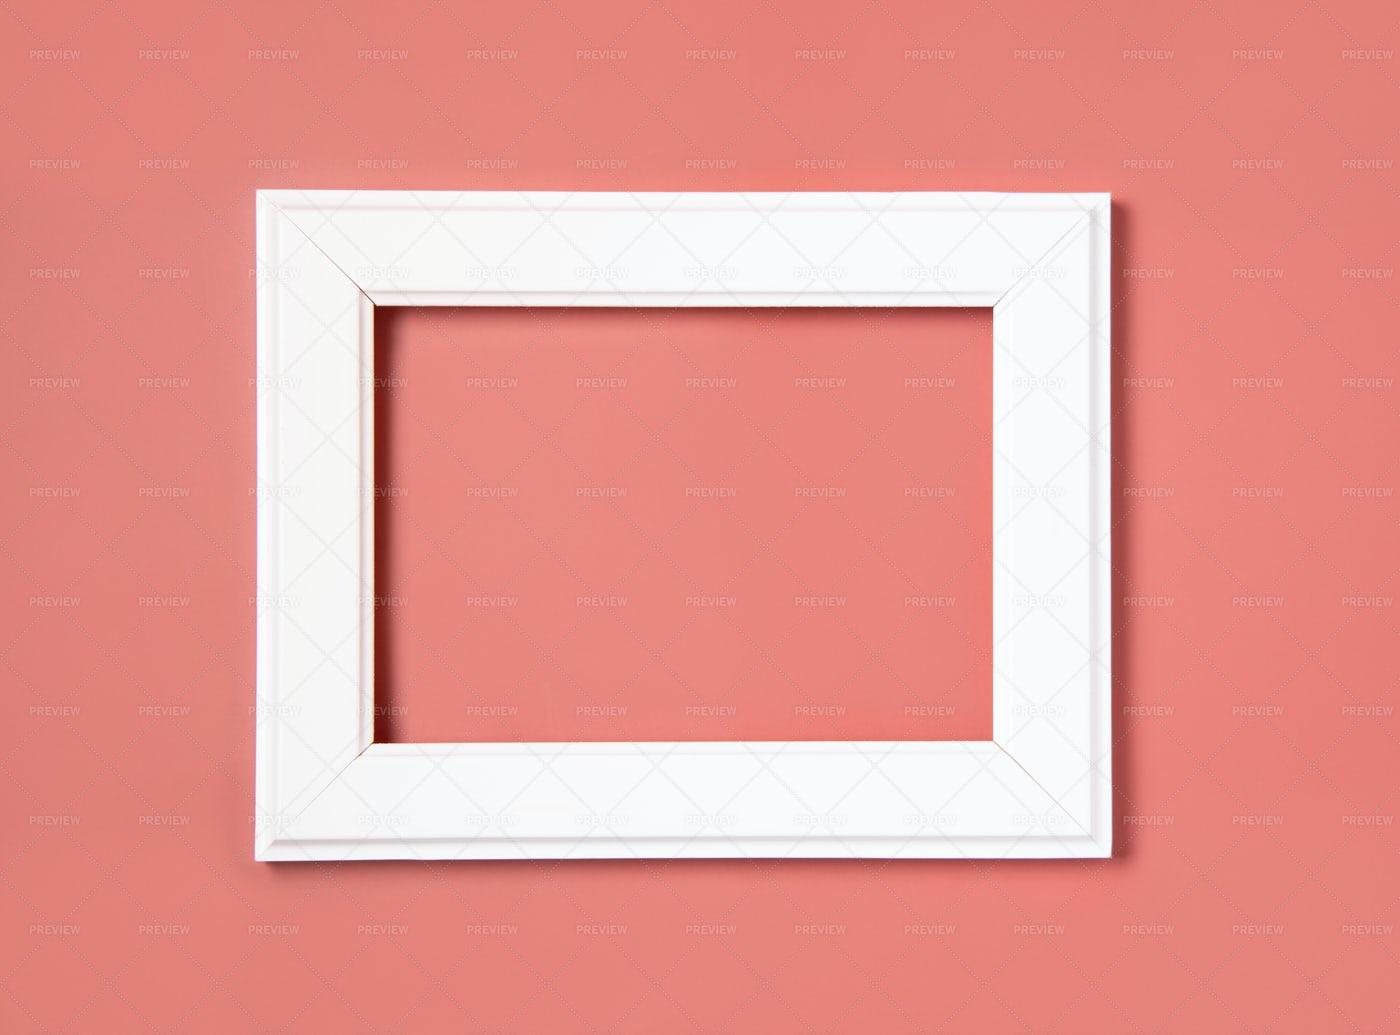 White Frame On The Pink: Stock Photos